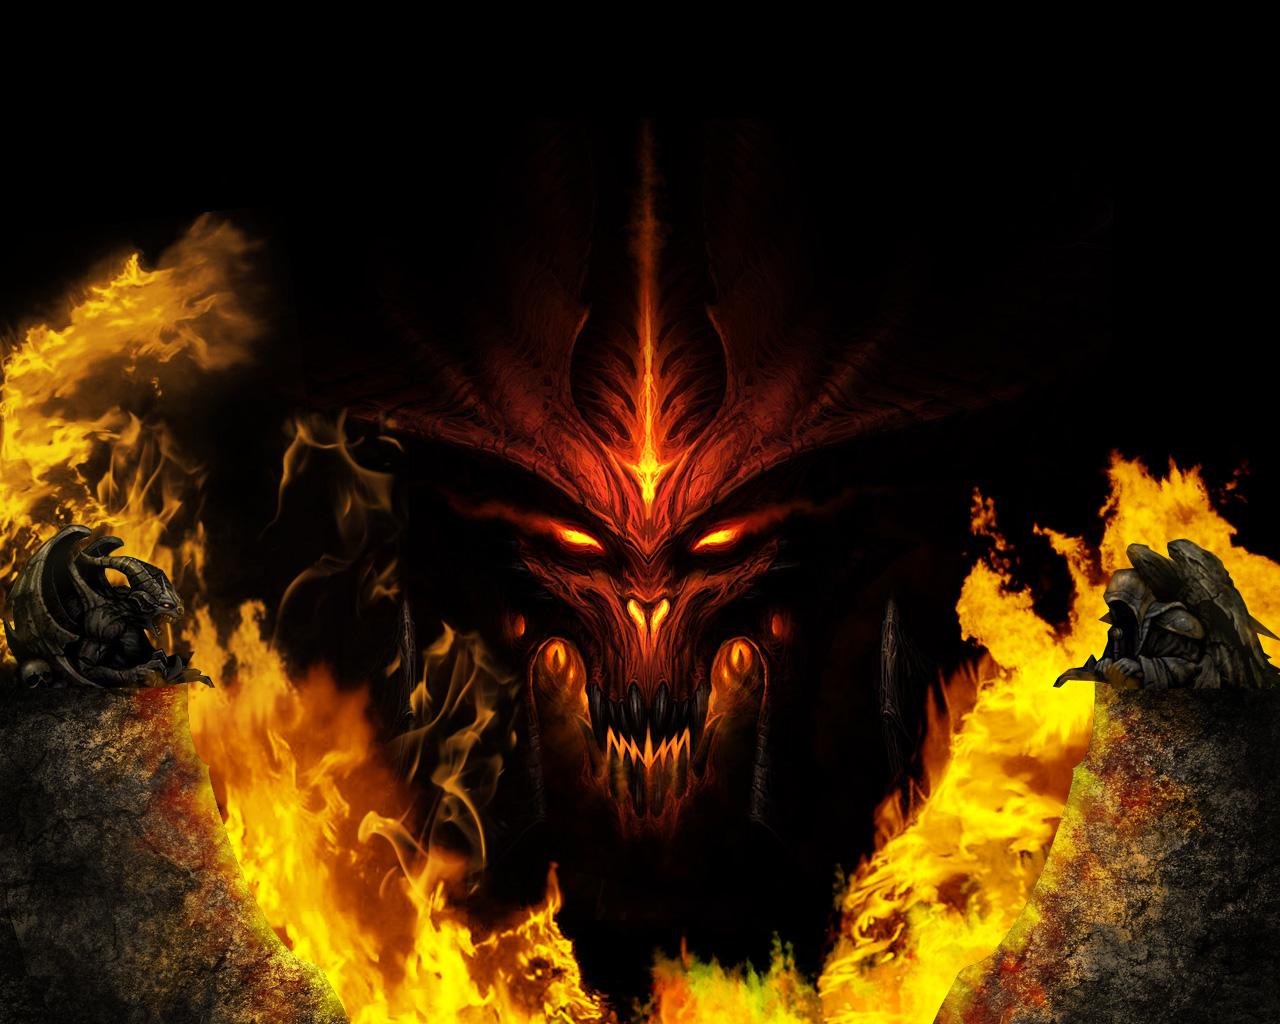 Diablo 3 gold